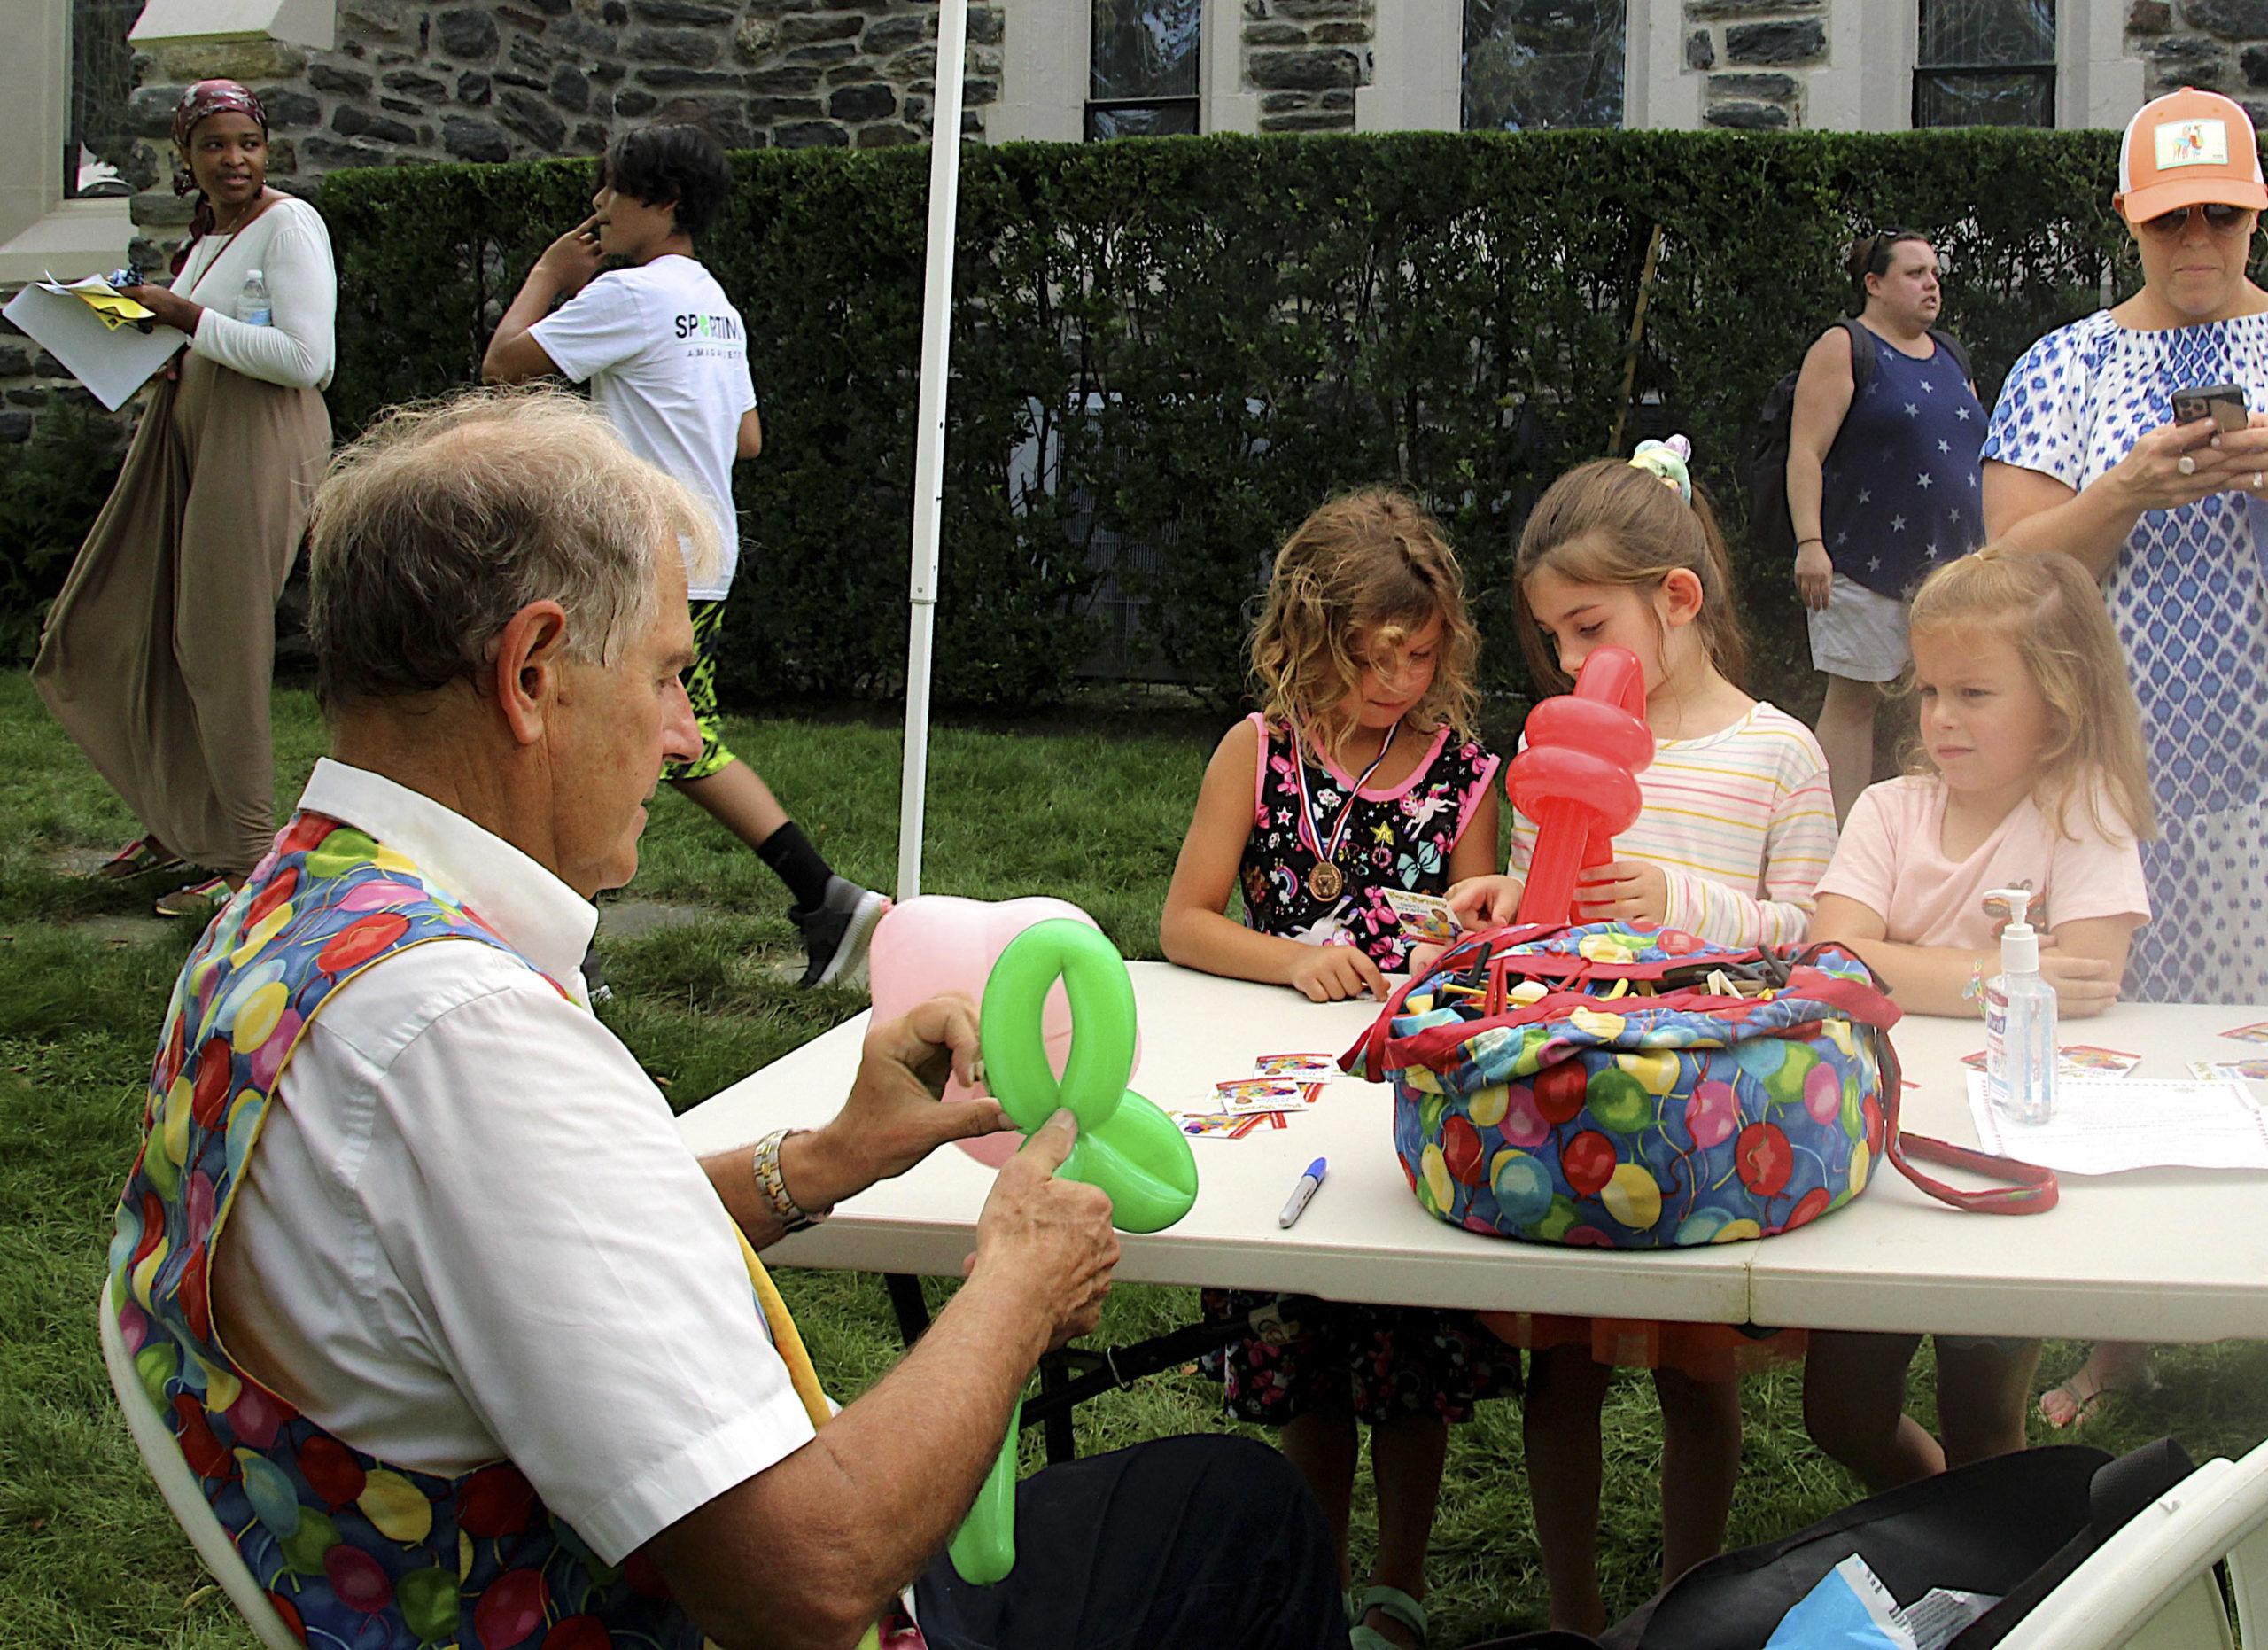 Mr. Twisty creates balloon animals at the St. Luke's Episcopal Church Fair on Saturday.  KYRIL BROMLEY